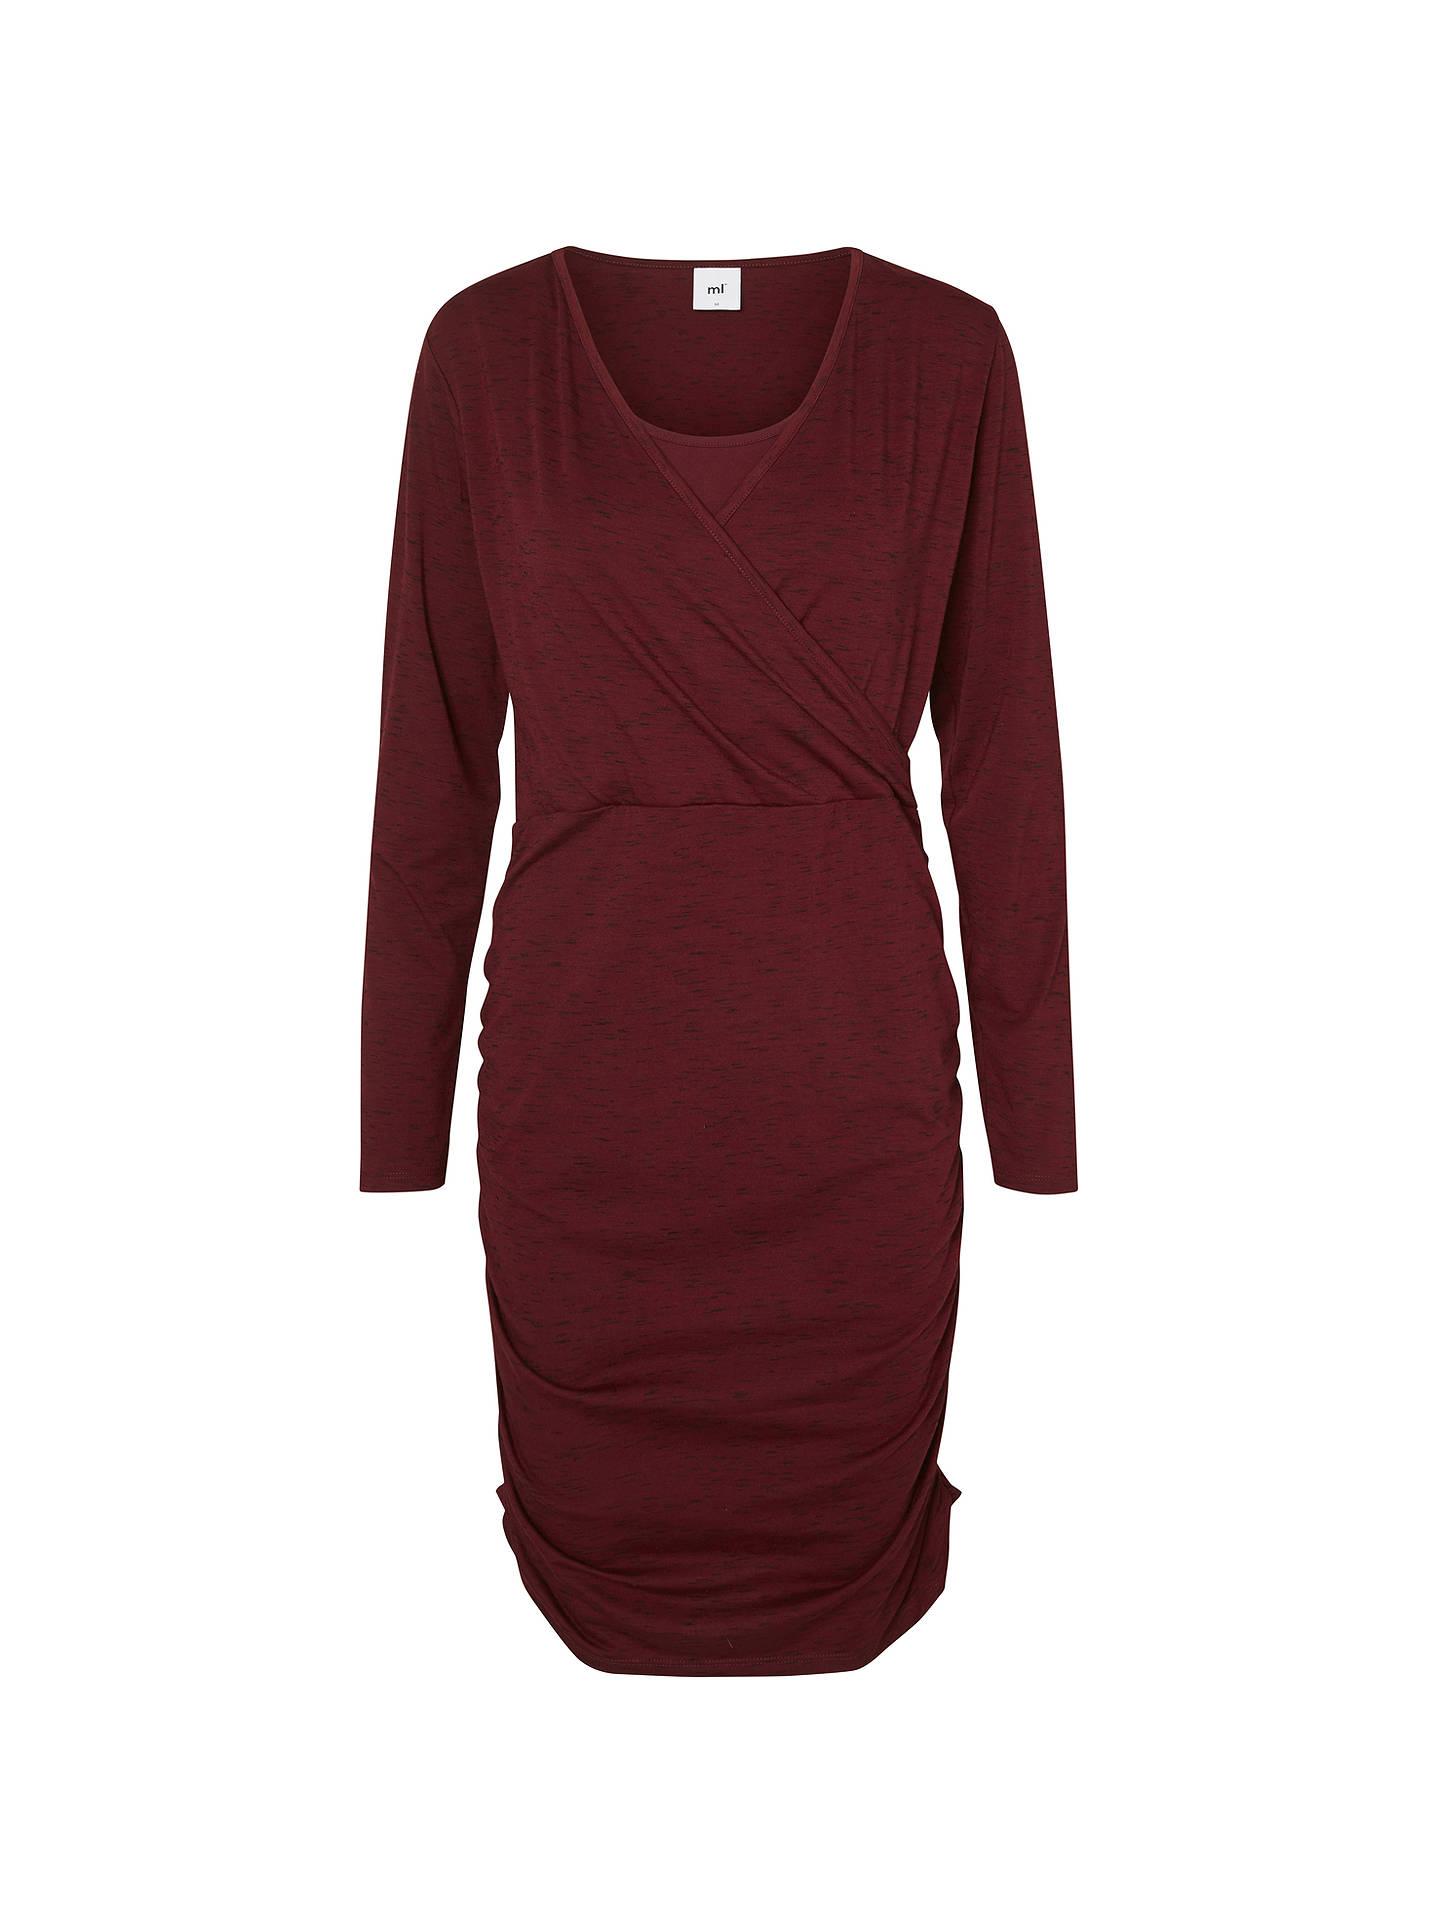 dac778aff8d83 Buy Mamalicious Miron Tess Long Sleeve Jersey Maternity Nursing Dress,  Burgundy, S Online at ...